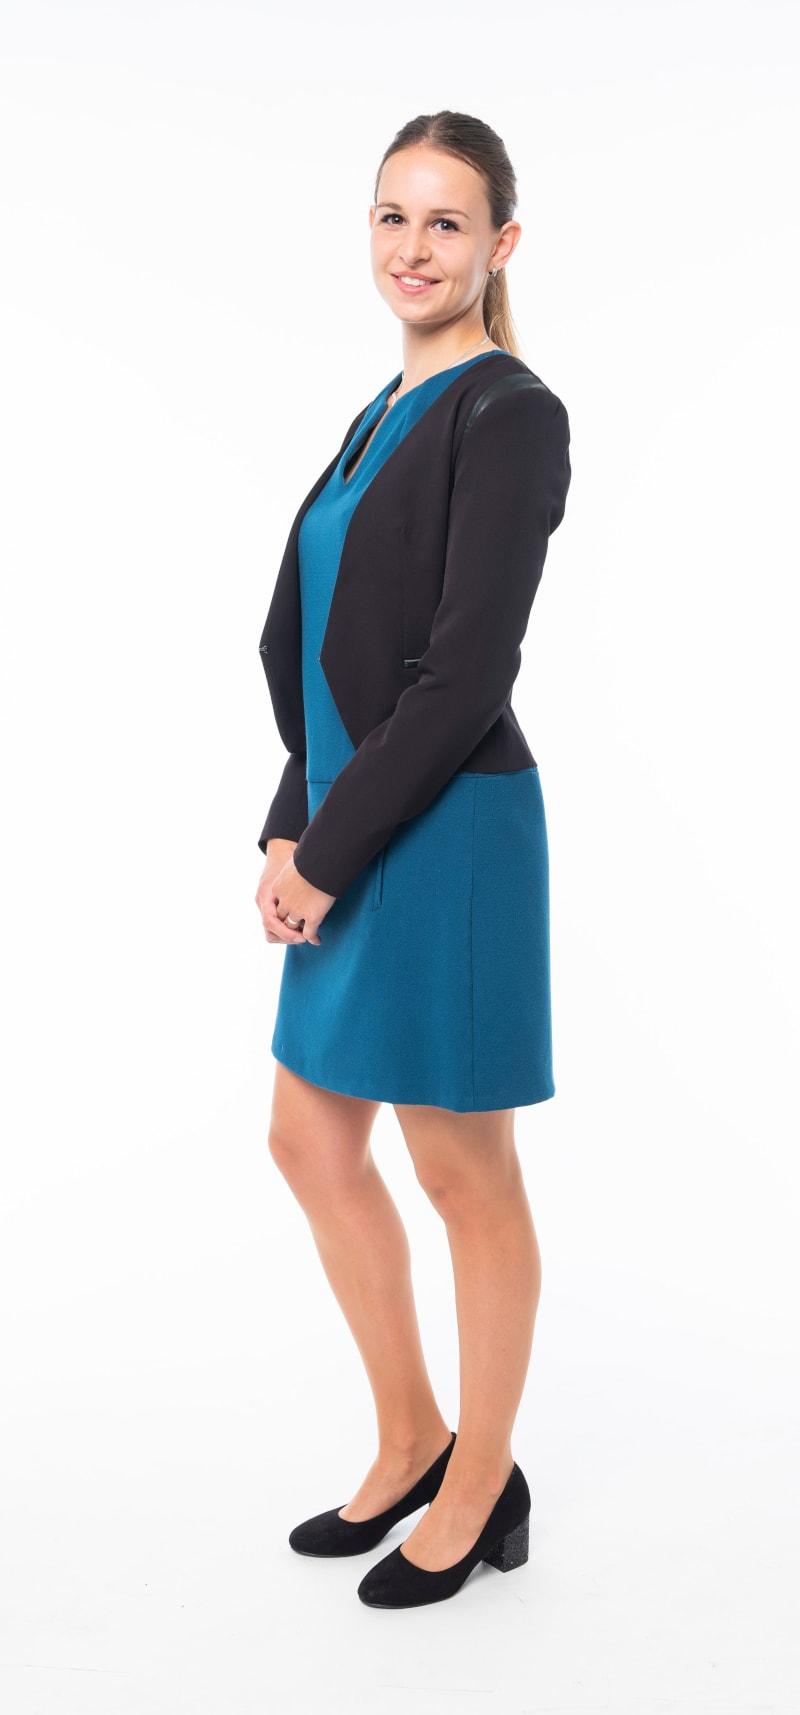 Robe bleue veste noire 2